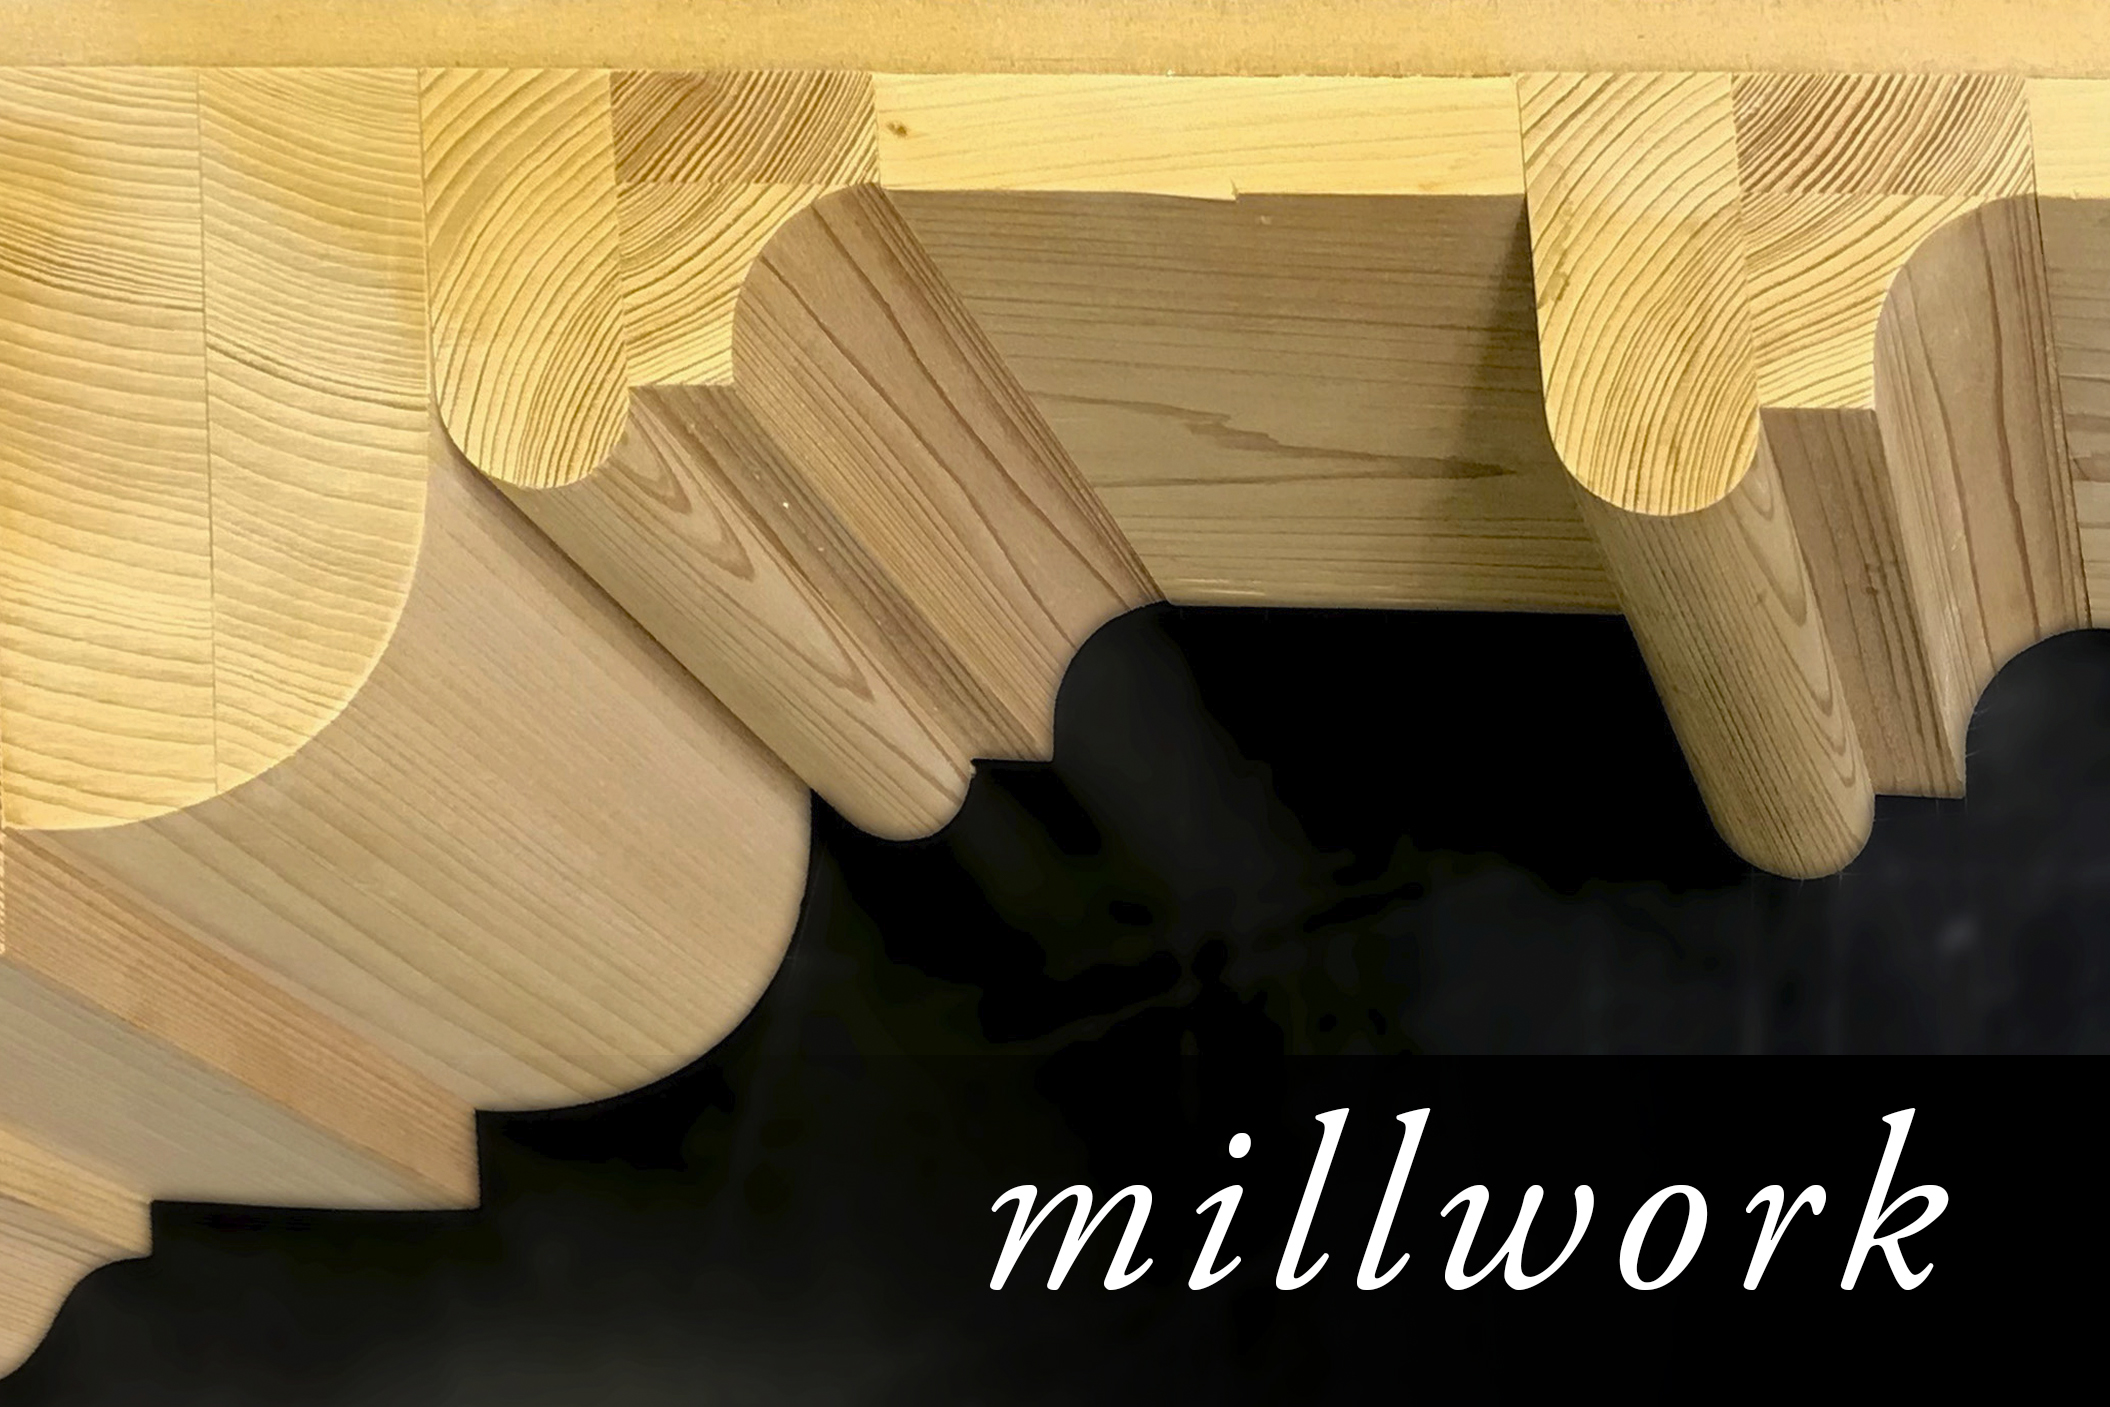 Millwork small text.jpg